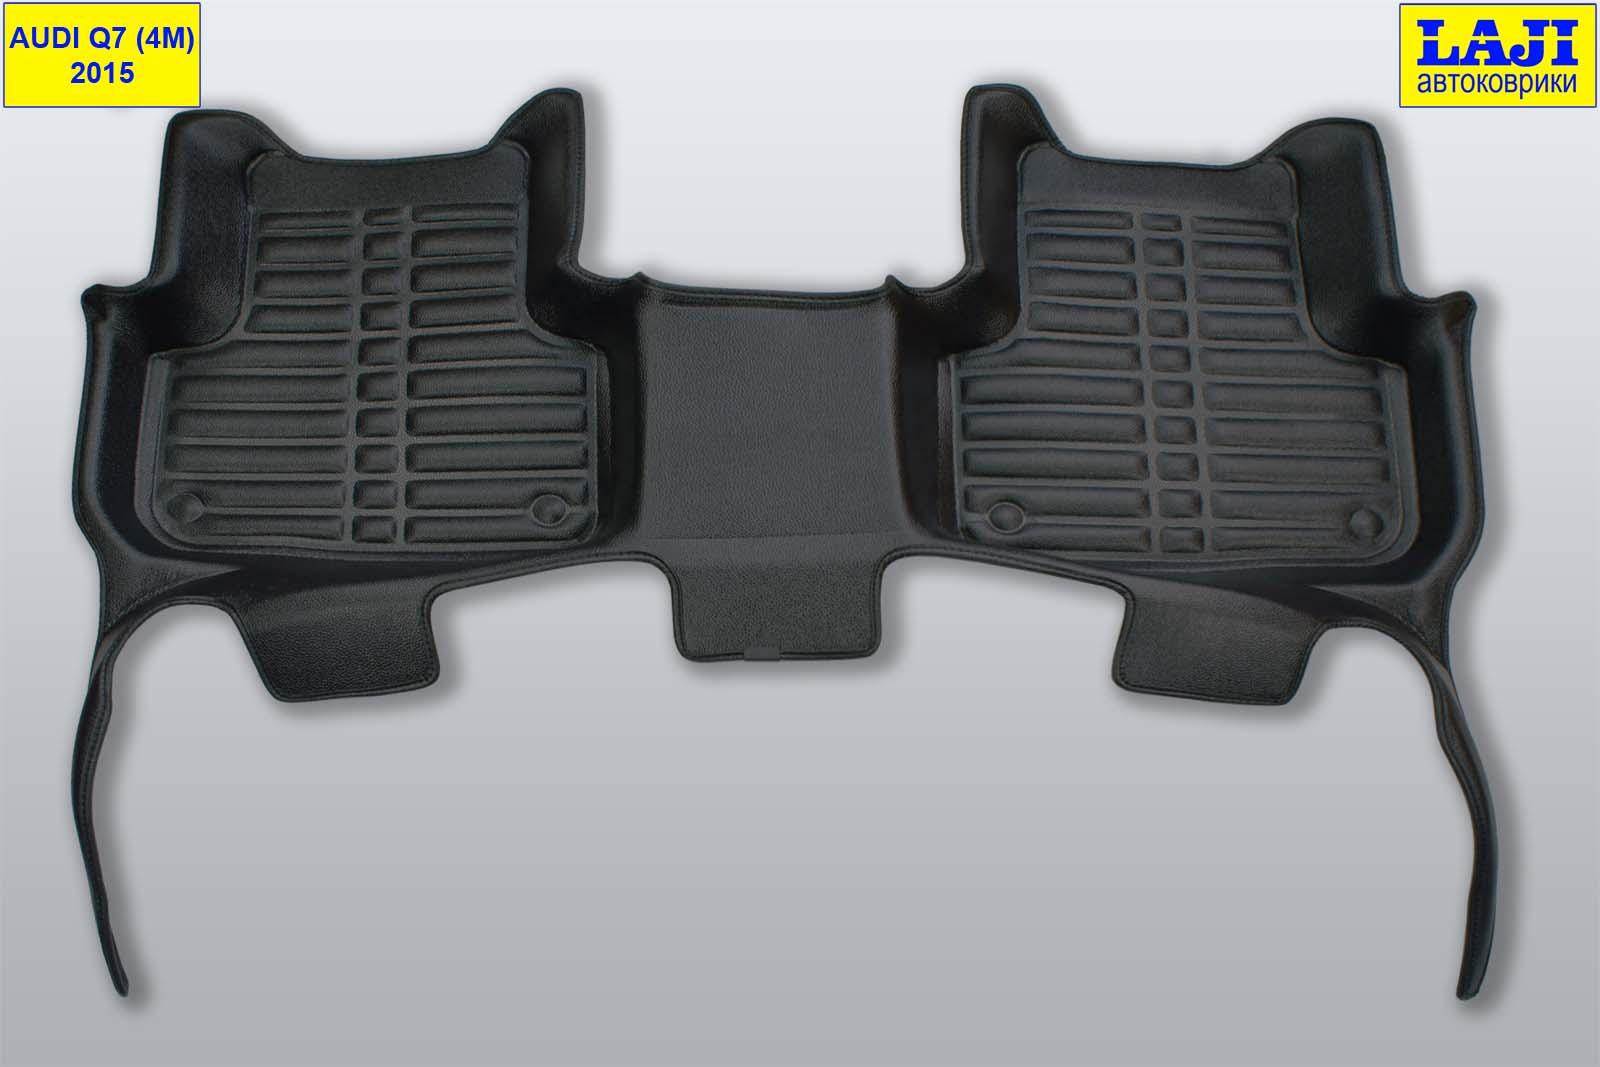 5D коврики для Audi Q7 4M 2015-н.в. 10